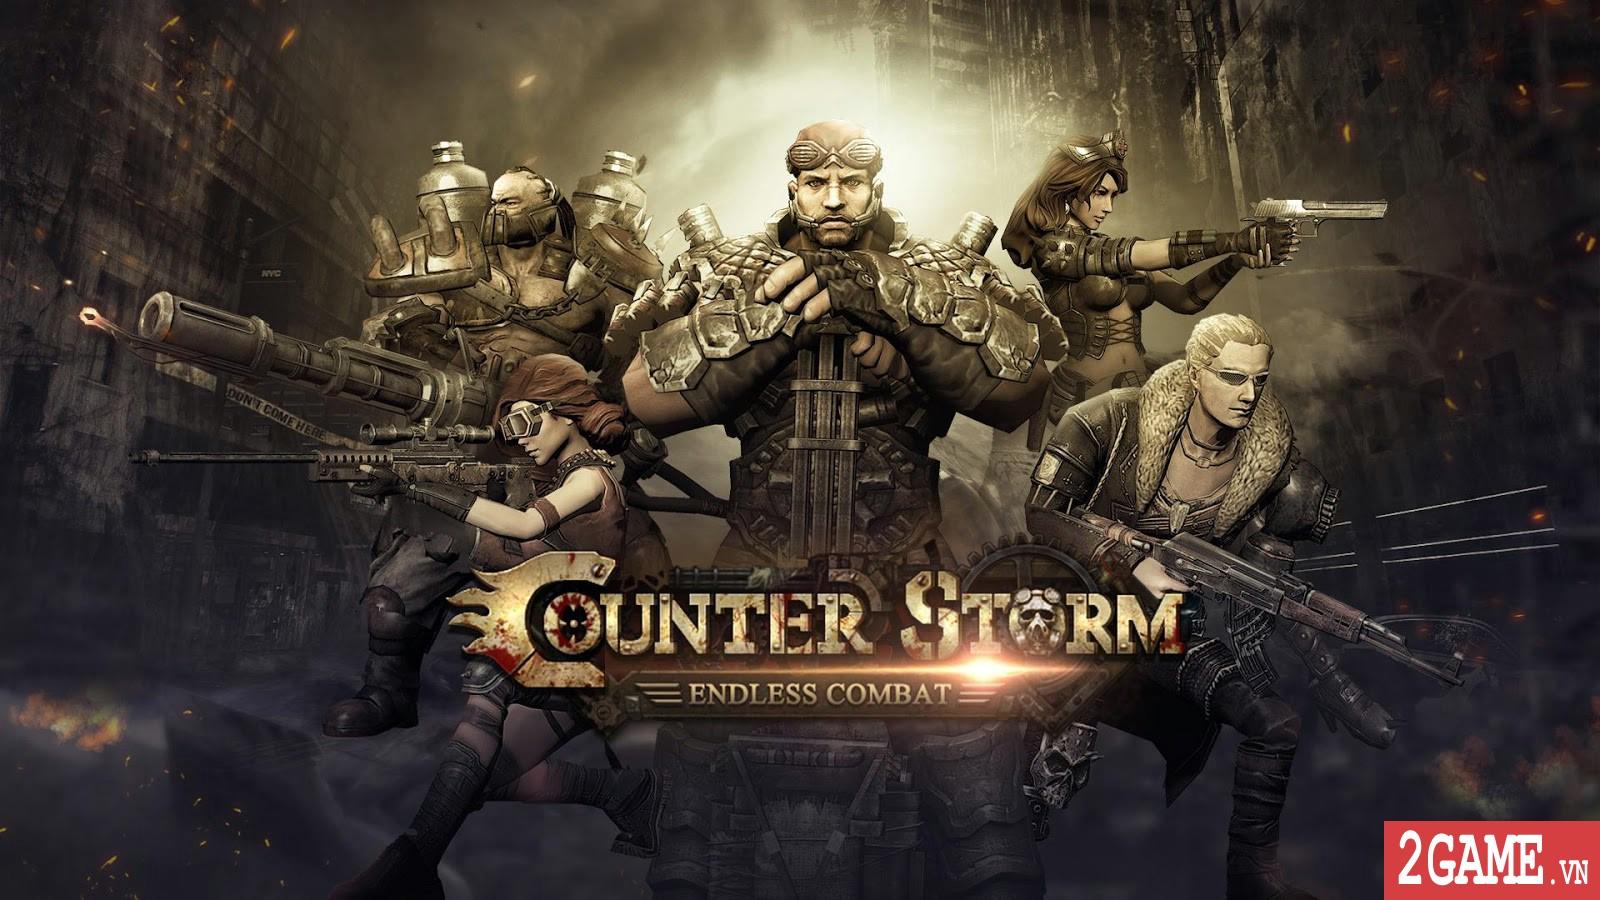 Counter Storm: Endless Combat